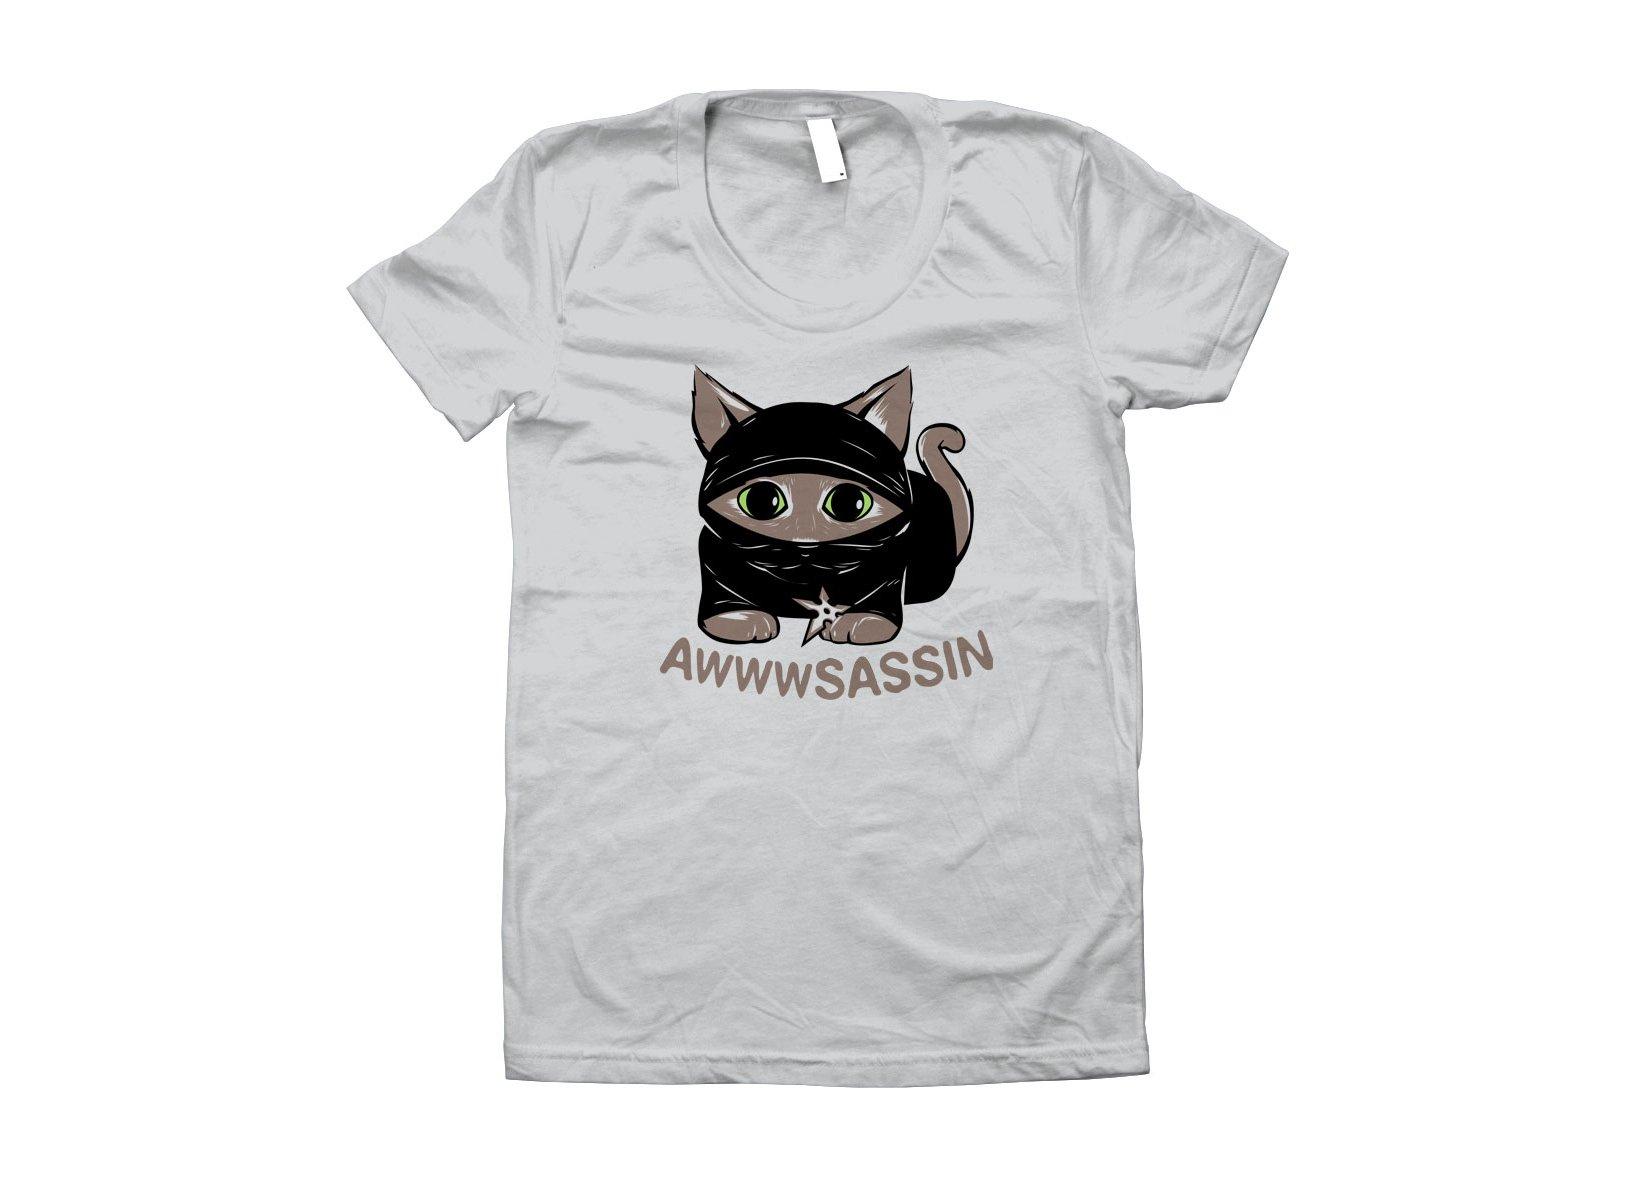 Awwwsassin on Juniors T-Shirt